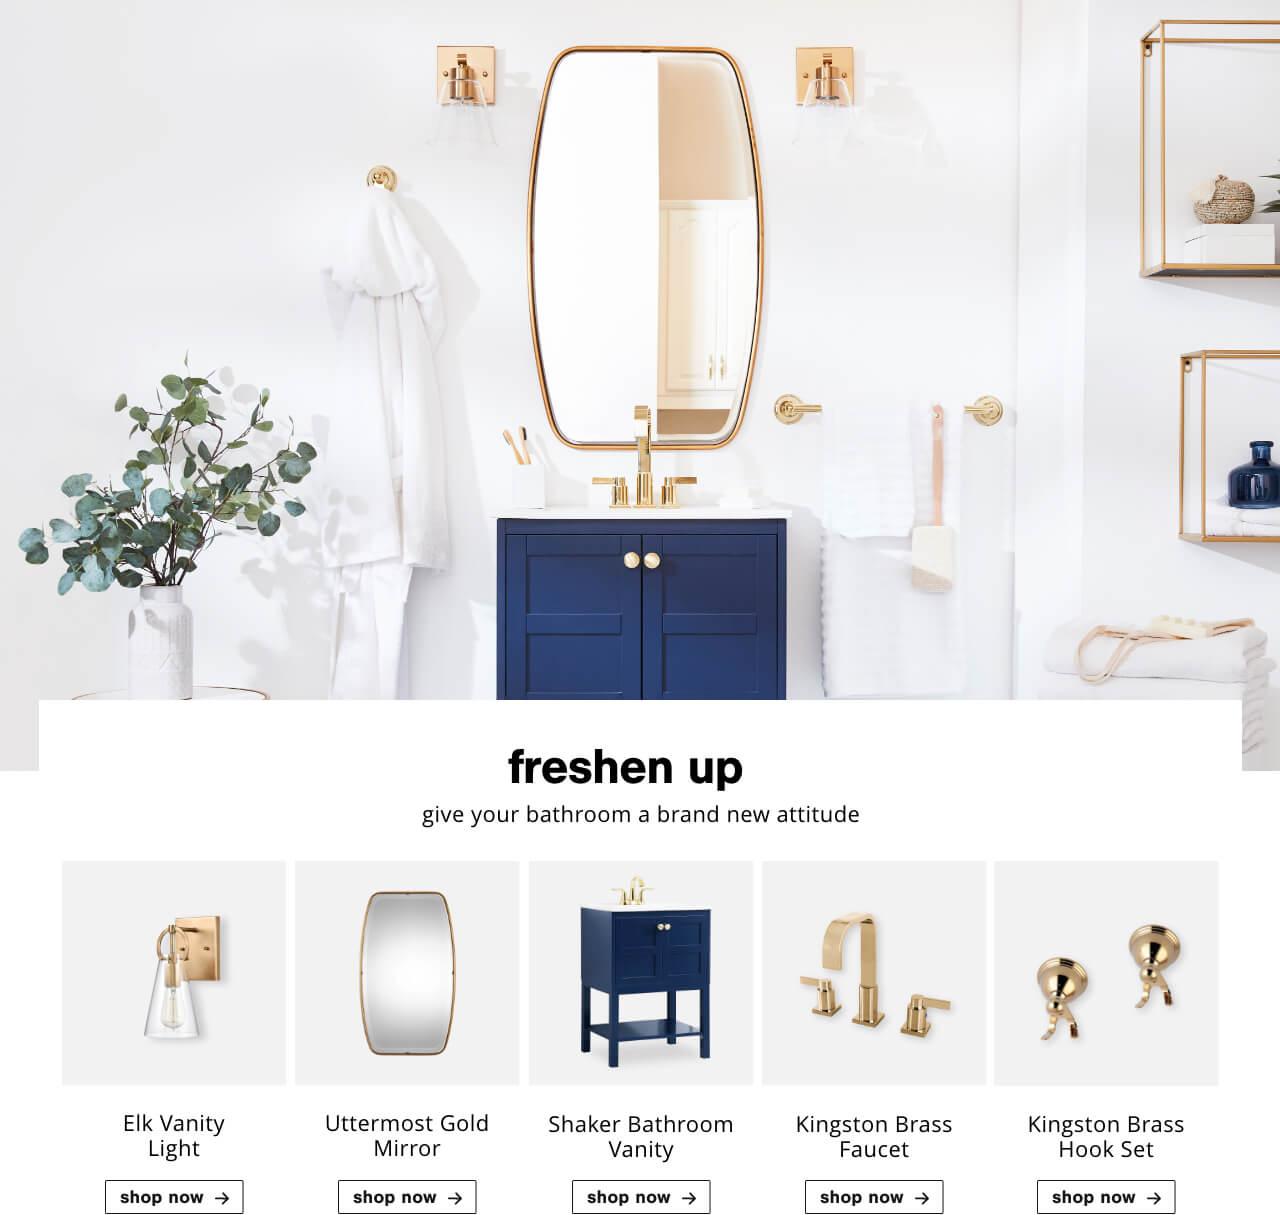 Elk Vanity Light,Uttermost Gold Mirror,Shaker Bathroom Vanity,Kingston Brass Faucet,Kingston Brass  Hook Set